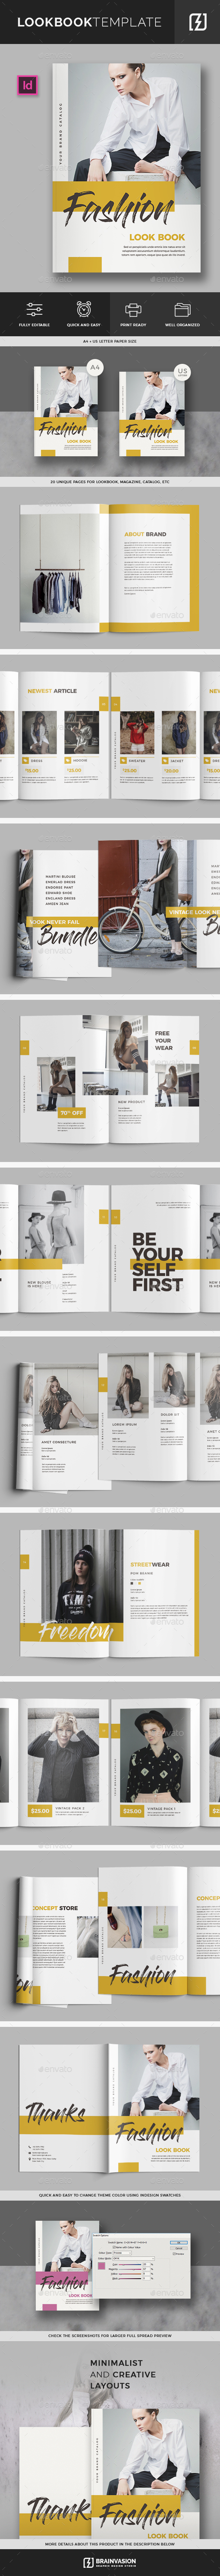 Lookbook/Fashion Magazine Template - Magazines Print Templates